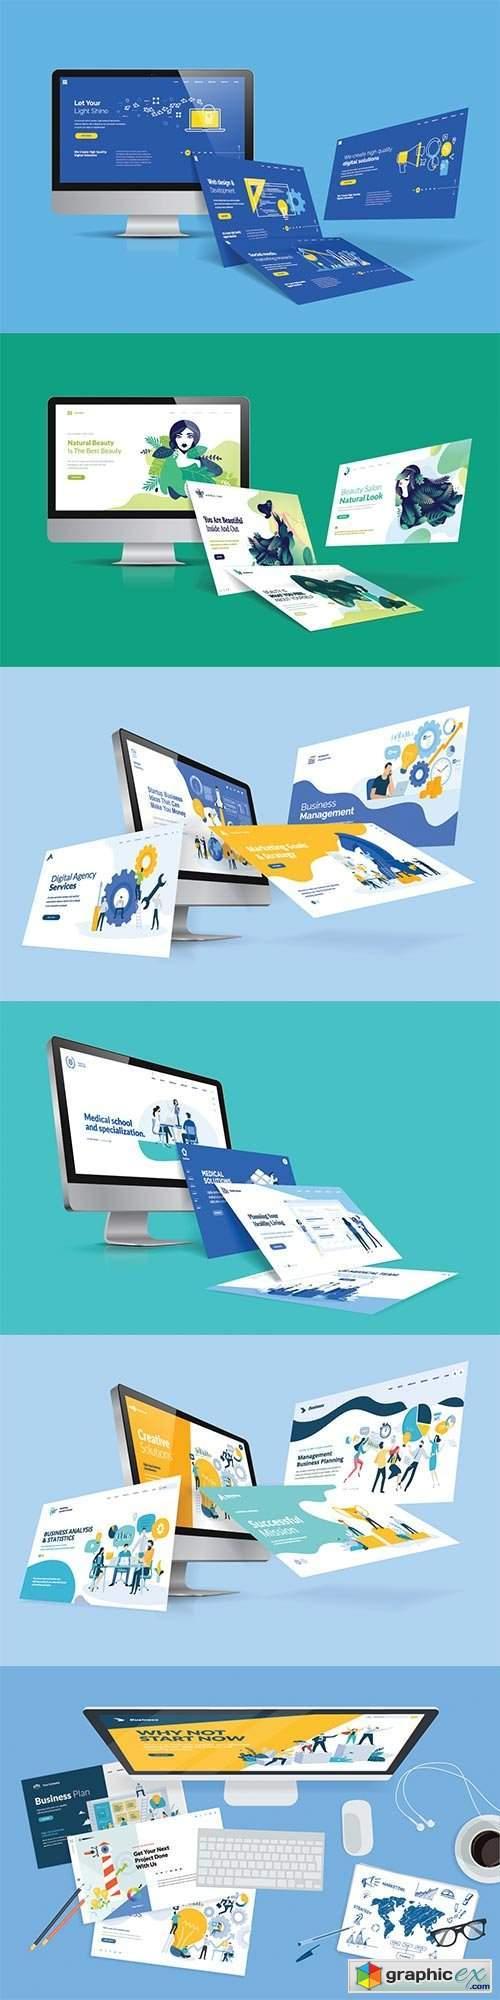 Creative workspace concept, top view, flat design vector